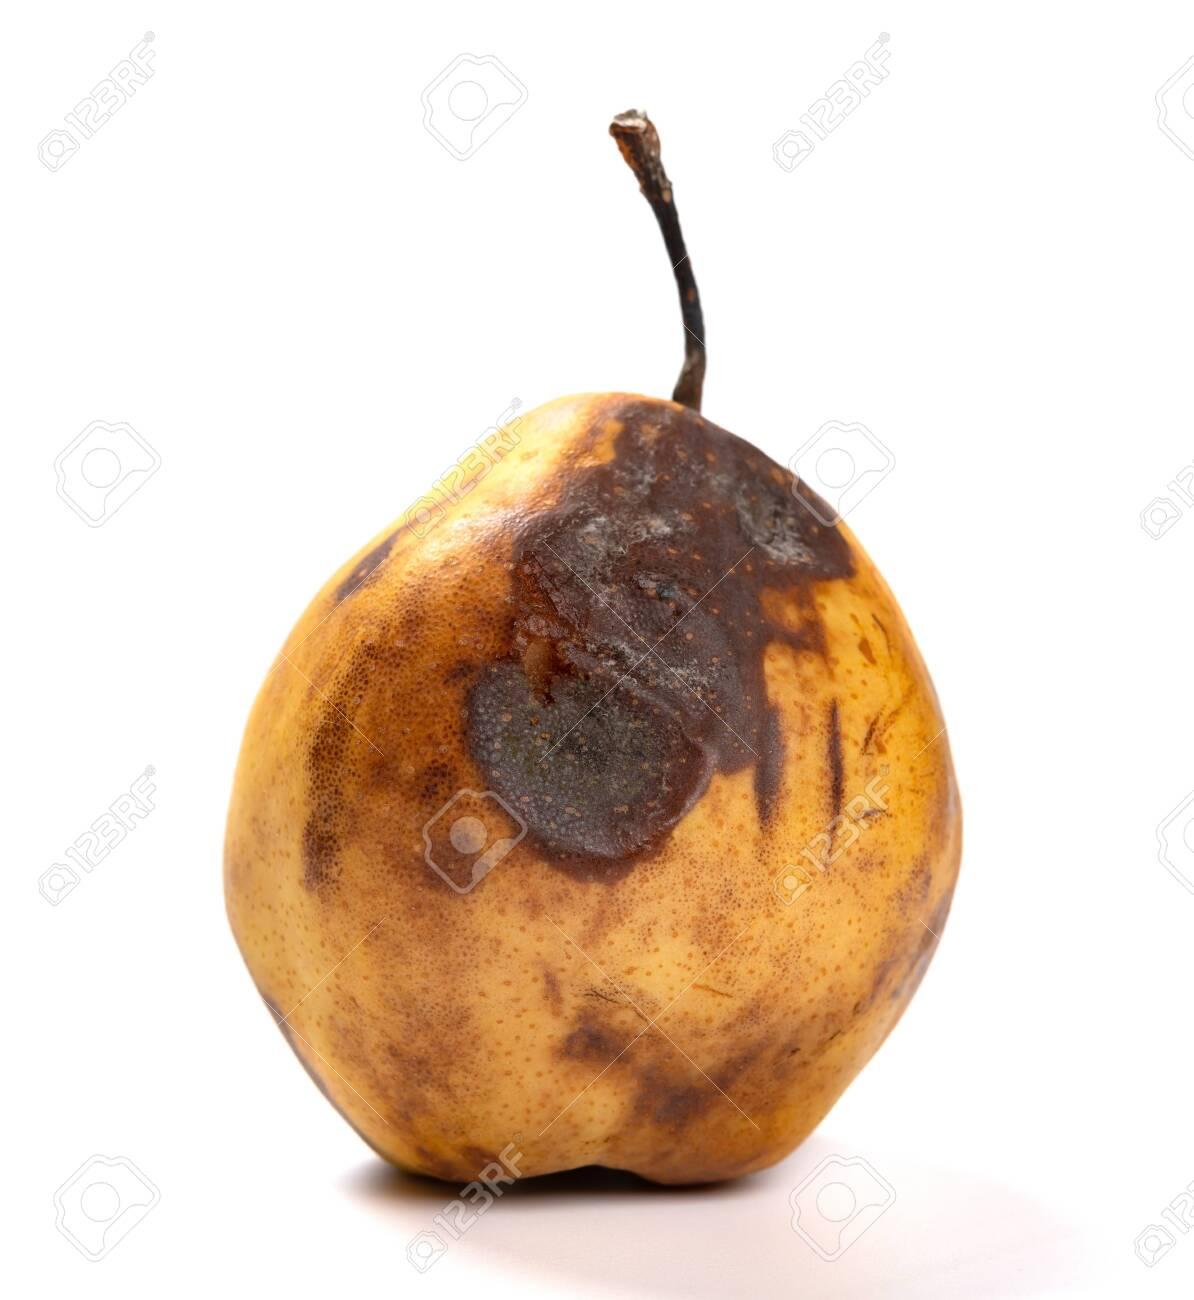 badly overripe pear on a dark background - 124687277